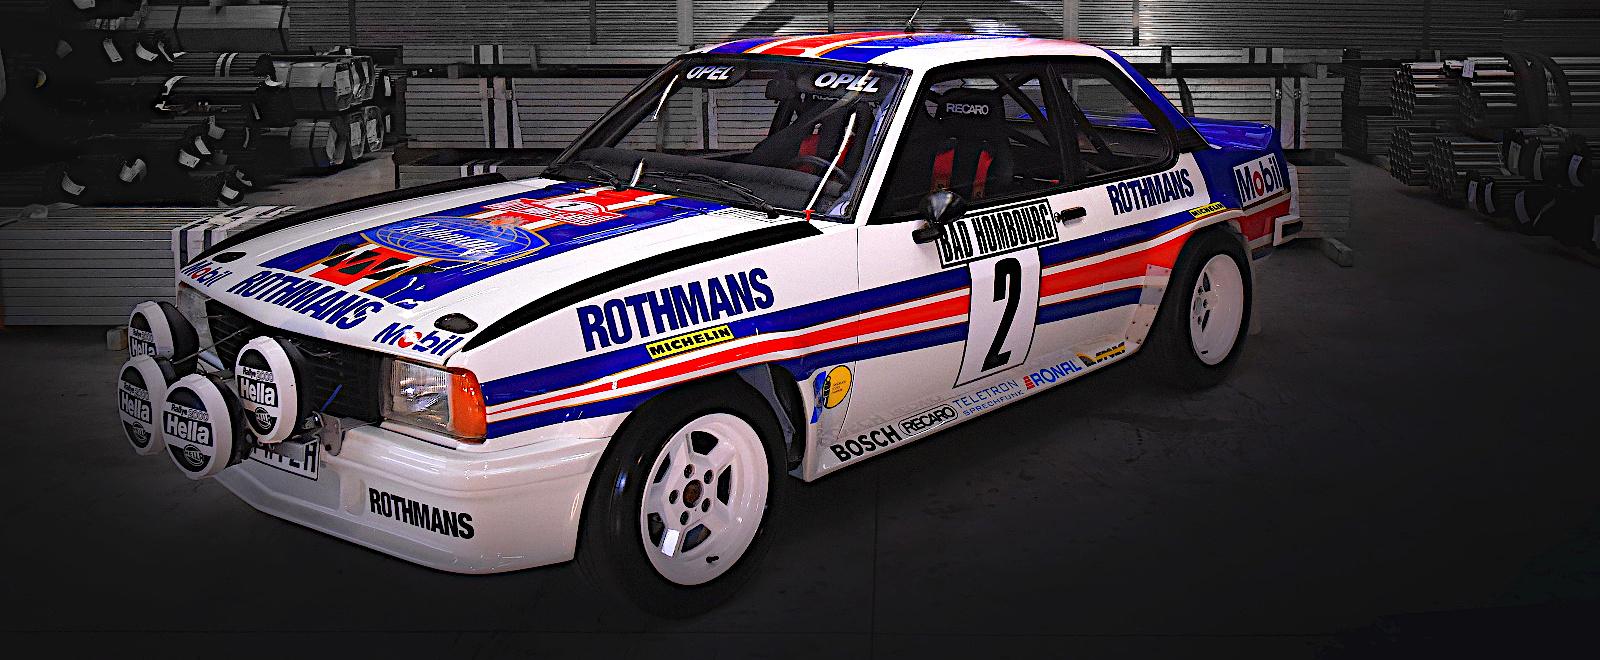 Historischer-Motorsport-Opel-Ascona.jpg